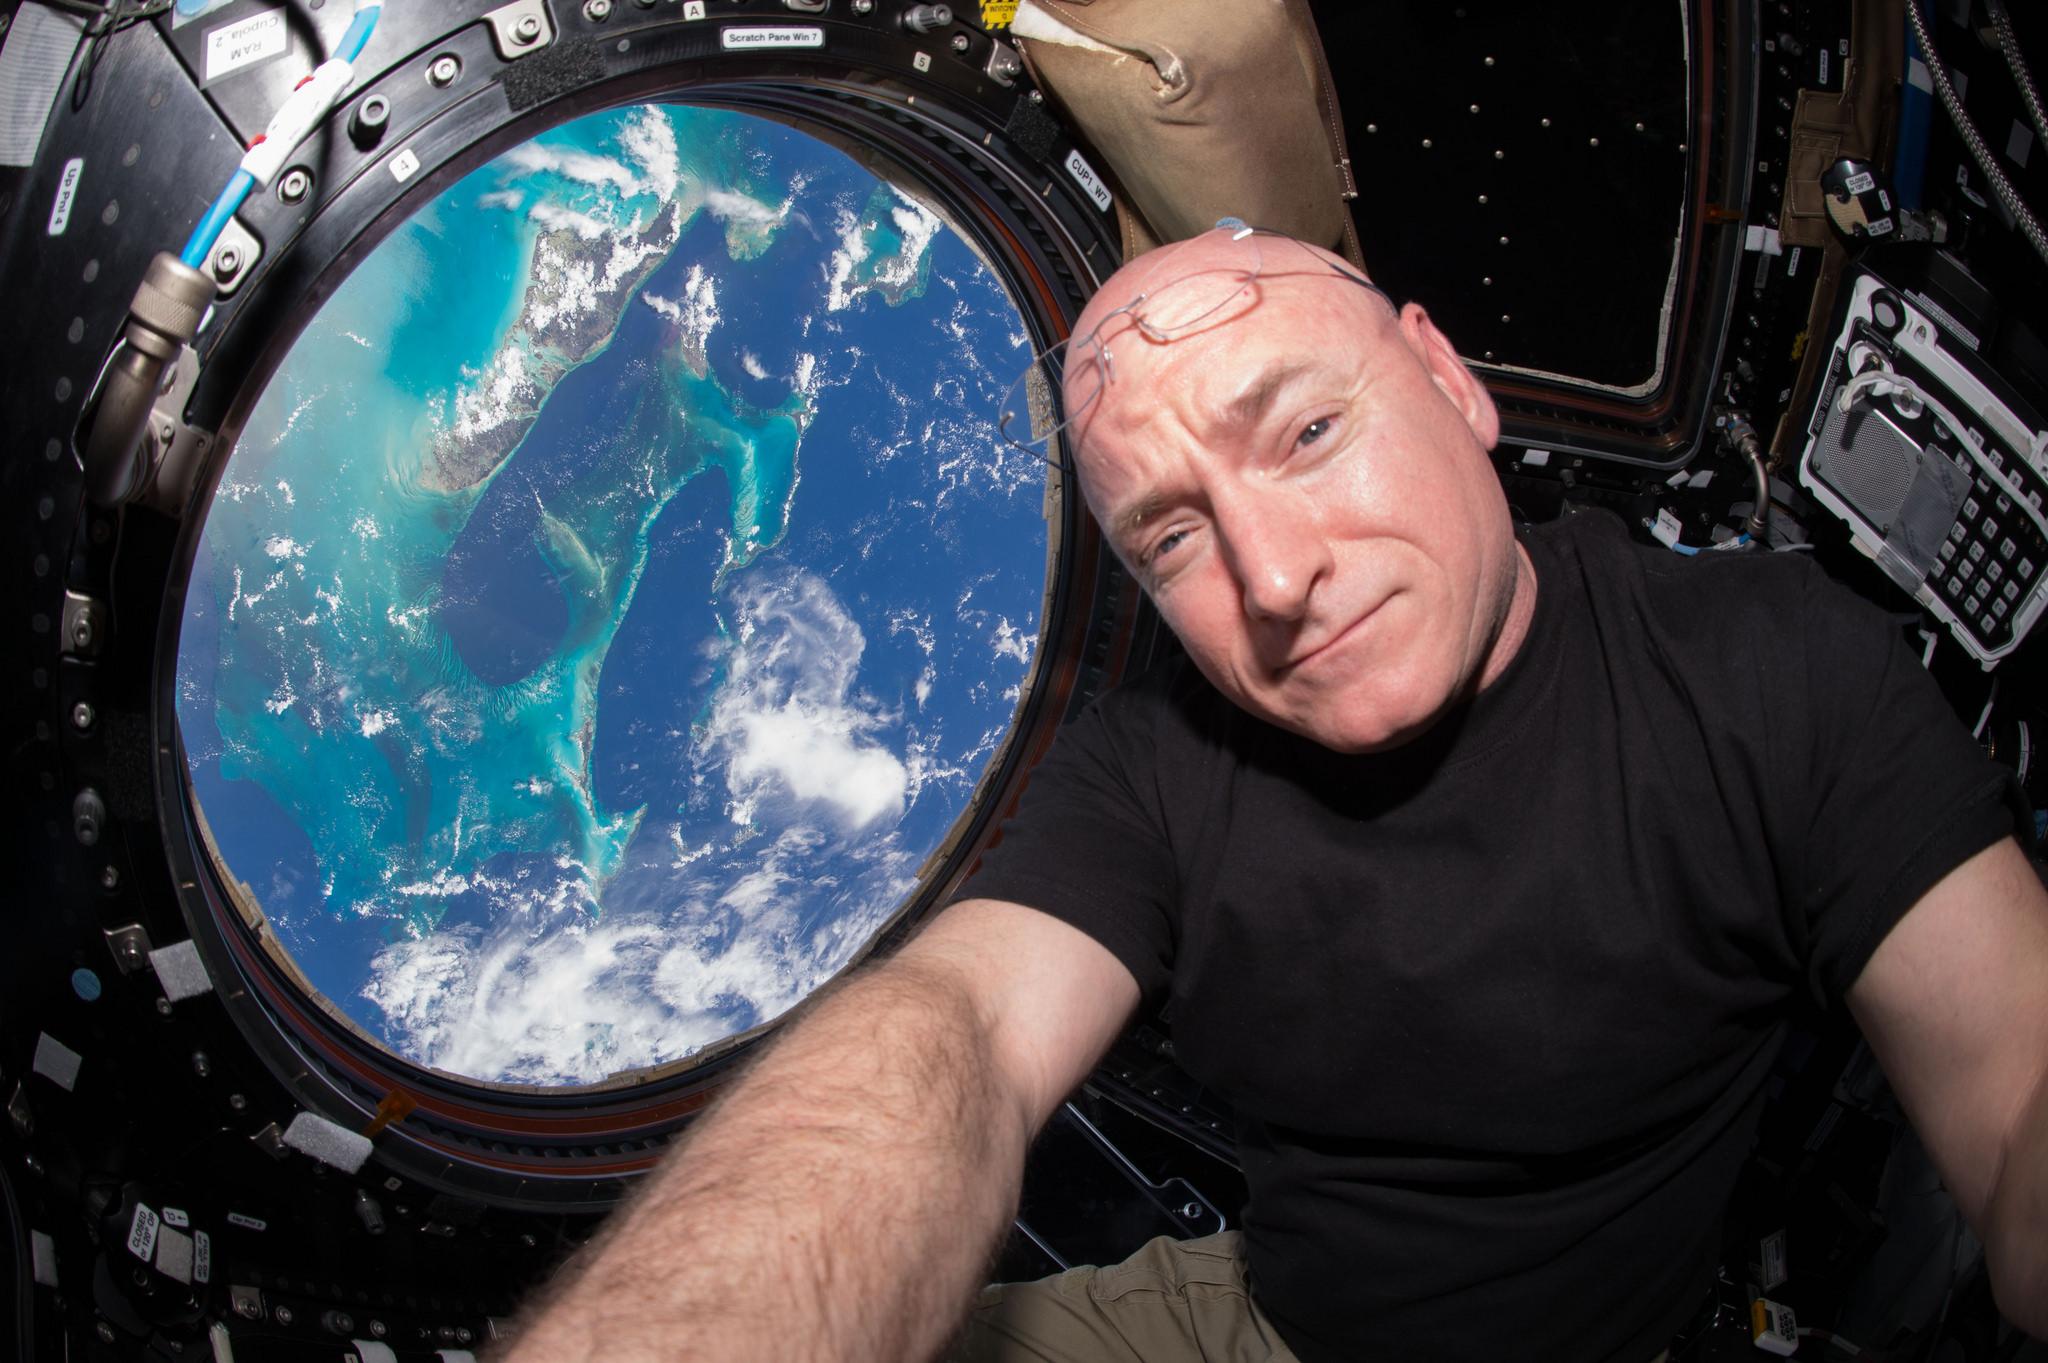 Scott Kelly, el astronauta más famoso del momento, abandona la NASA